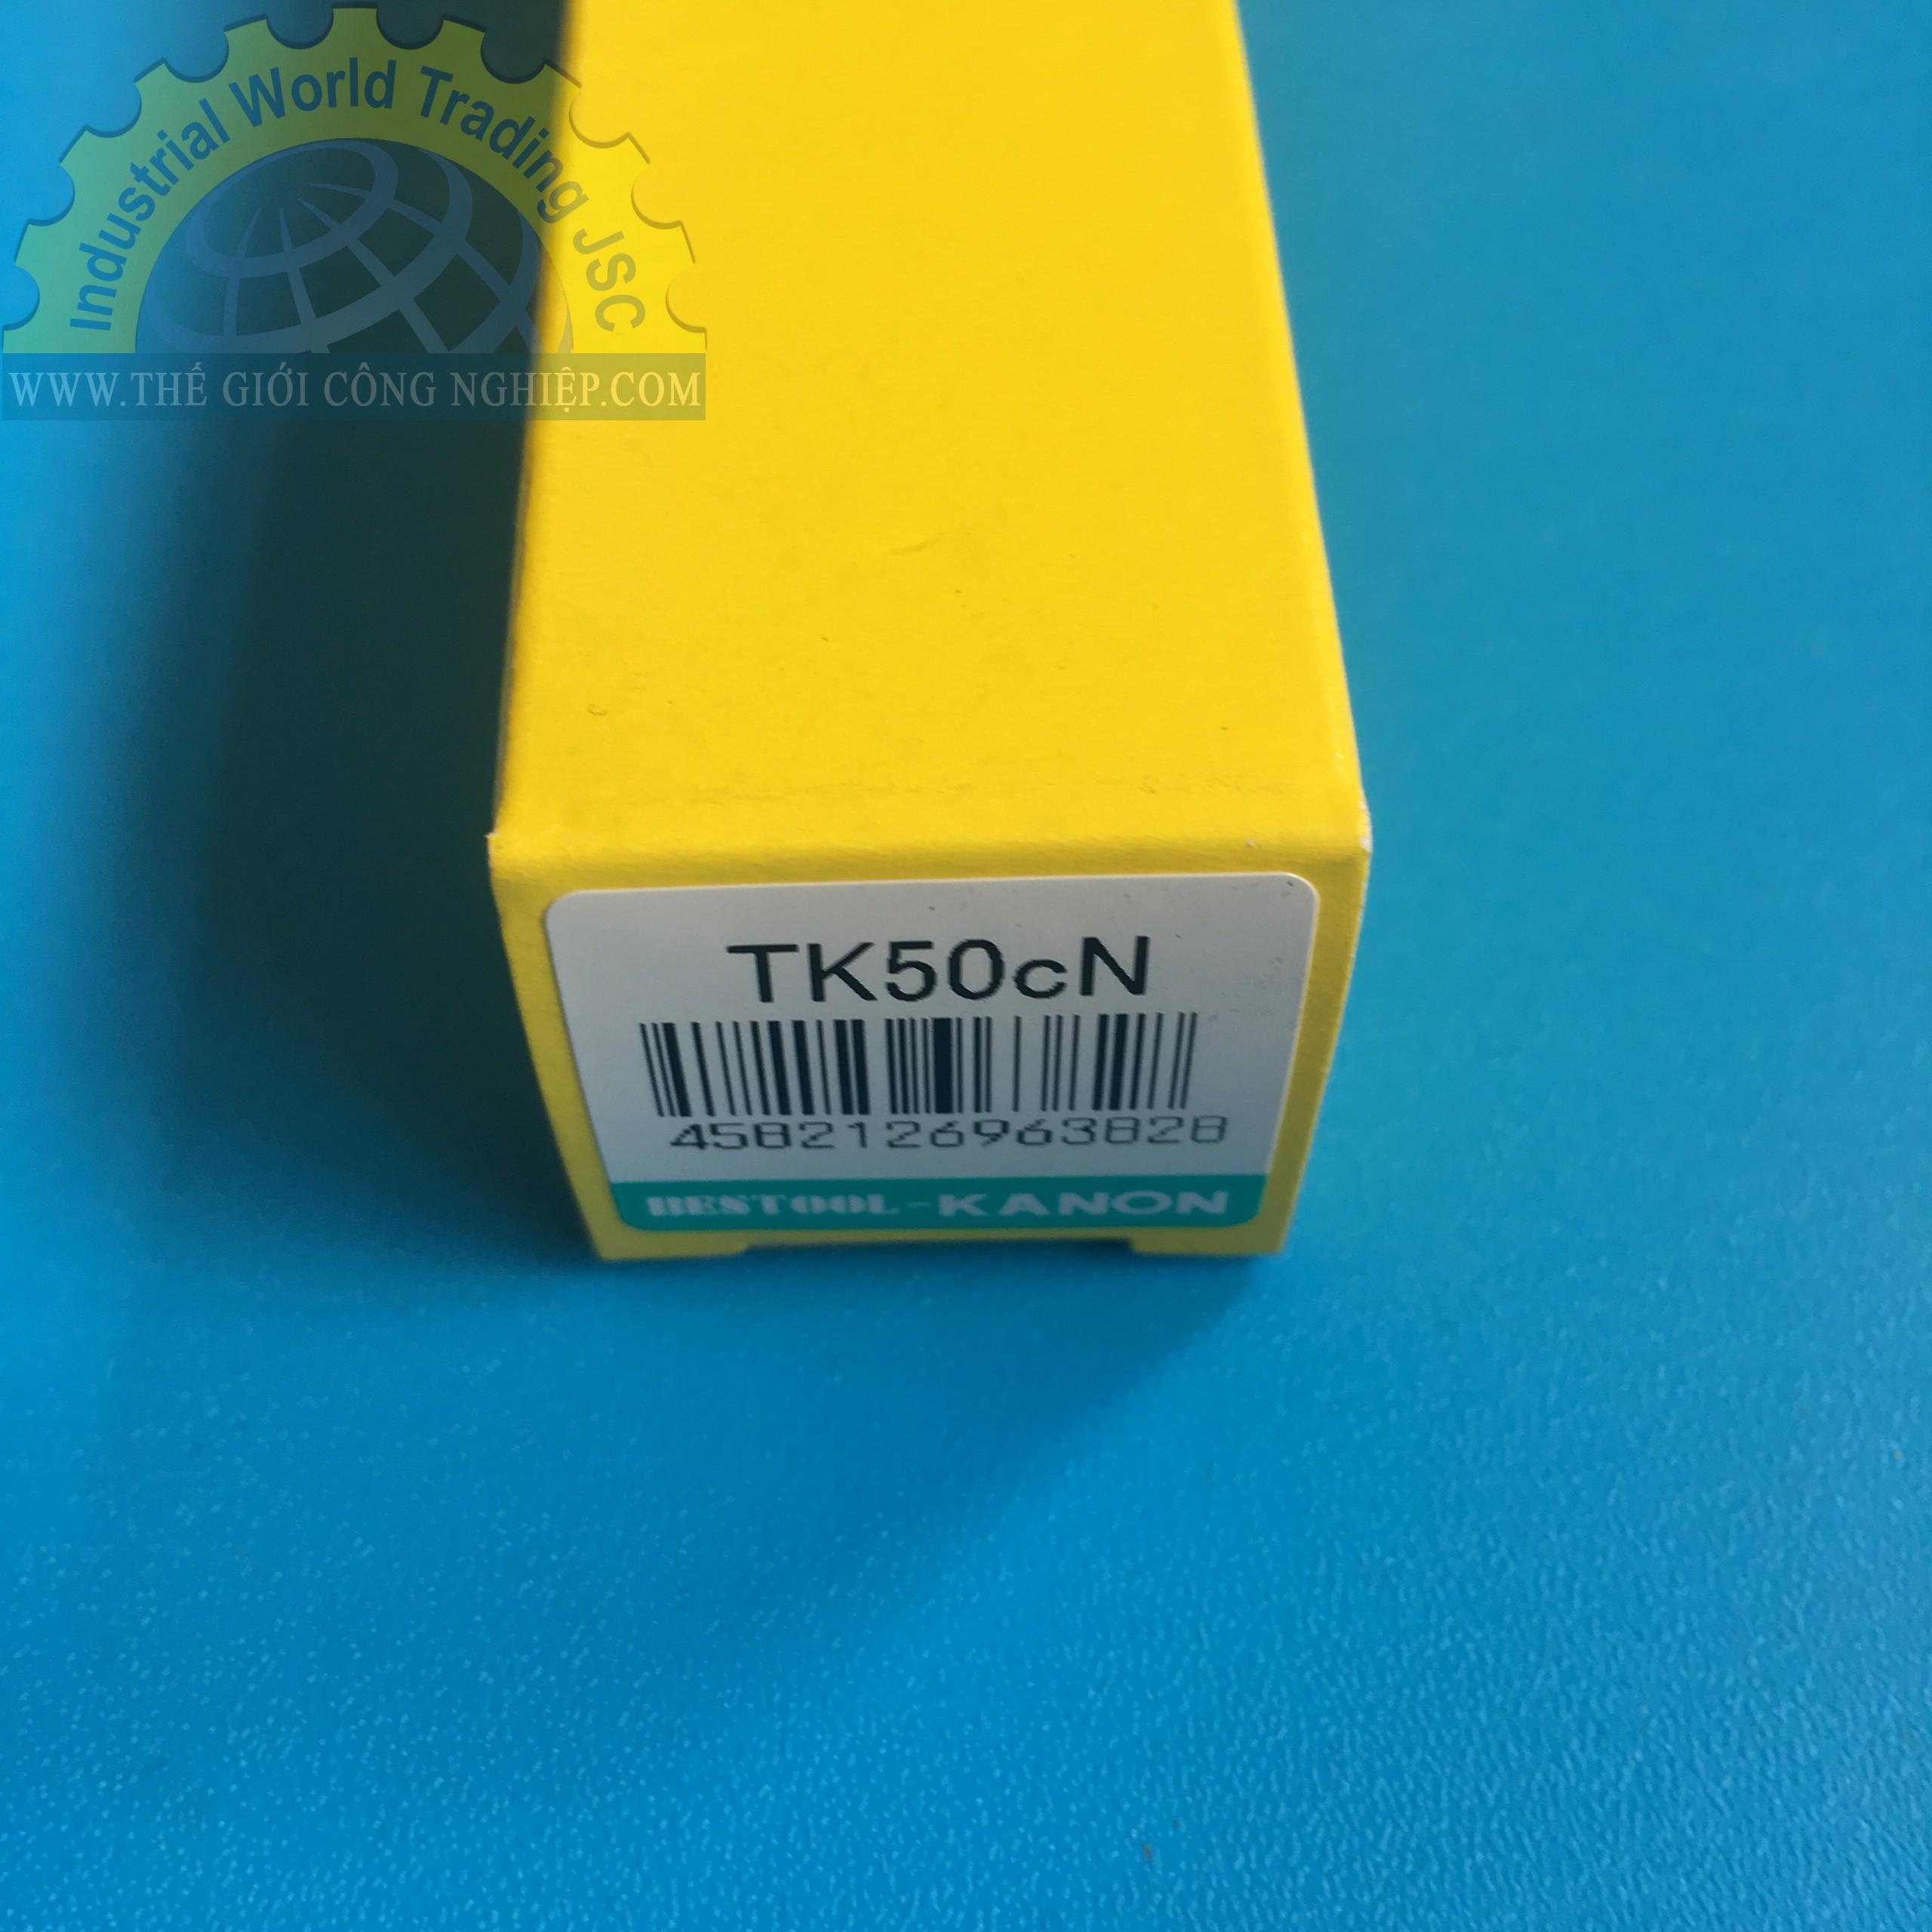 Cân lò xo 0 – 50cN  TK50CN Kanon